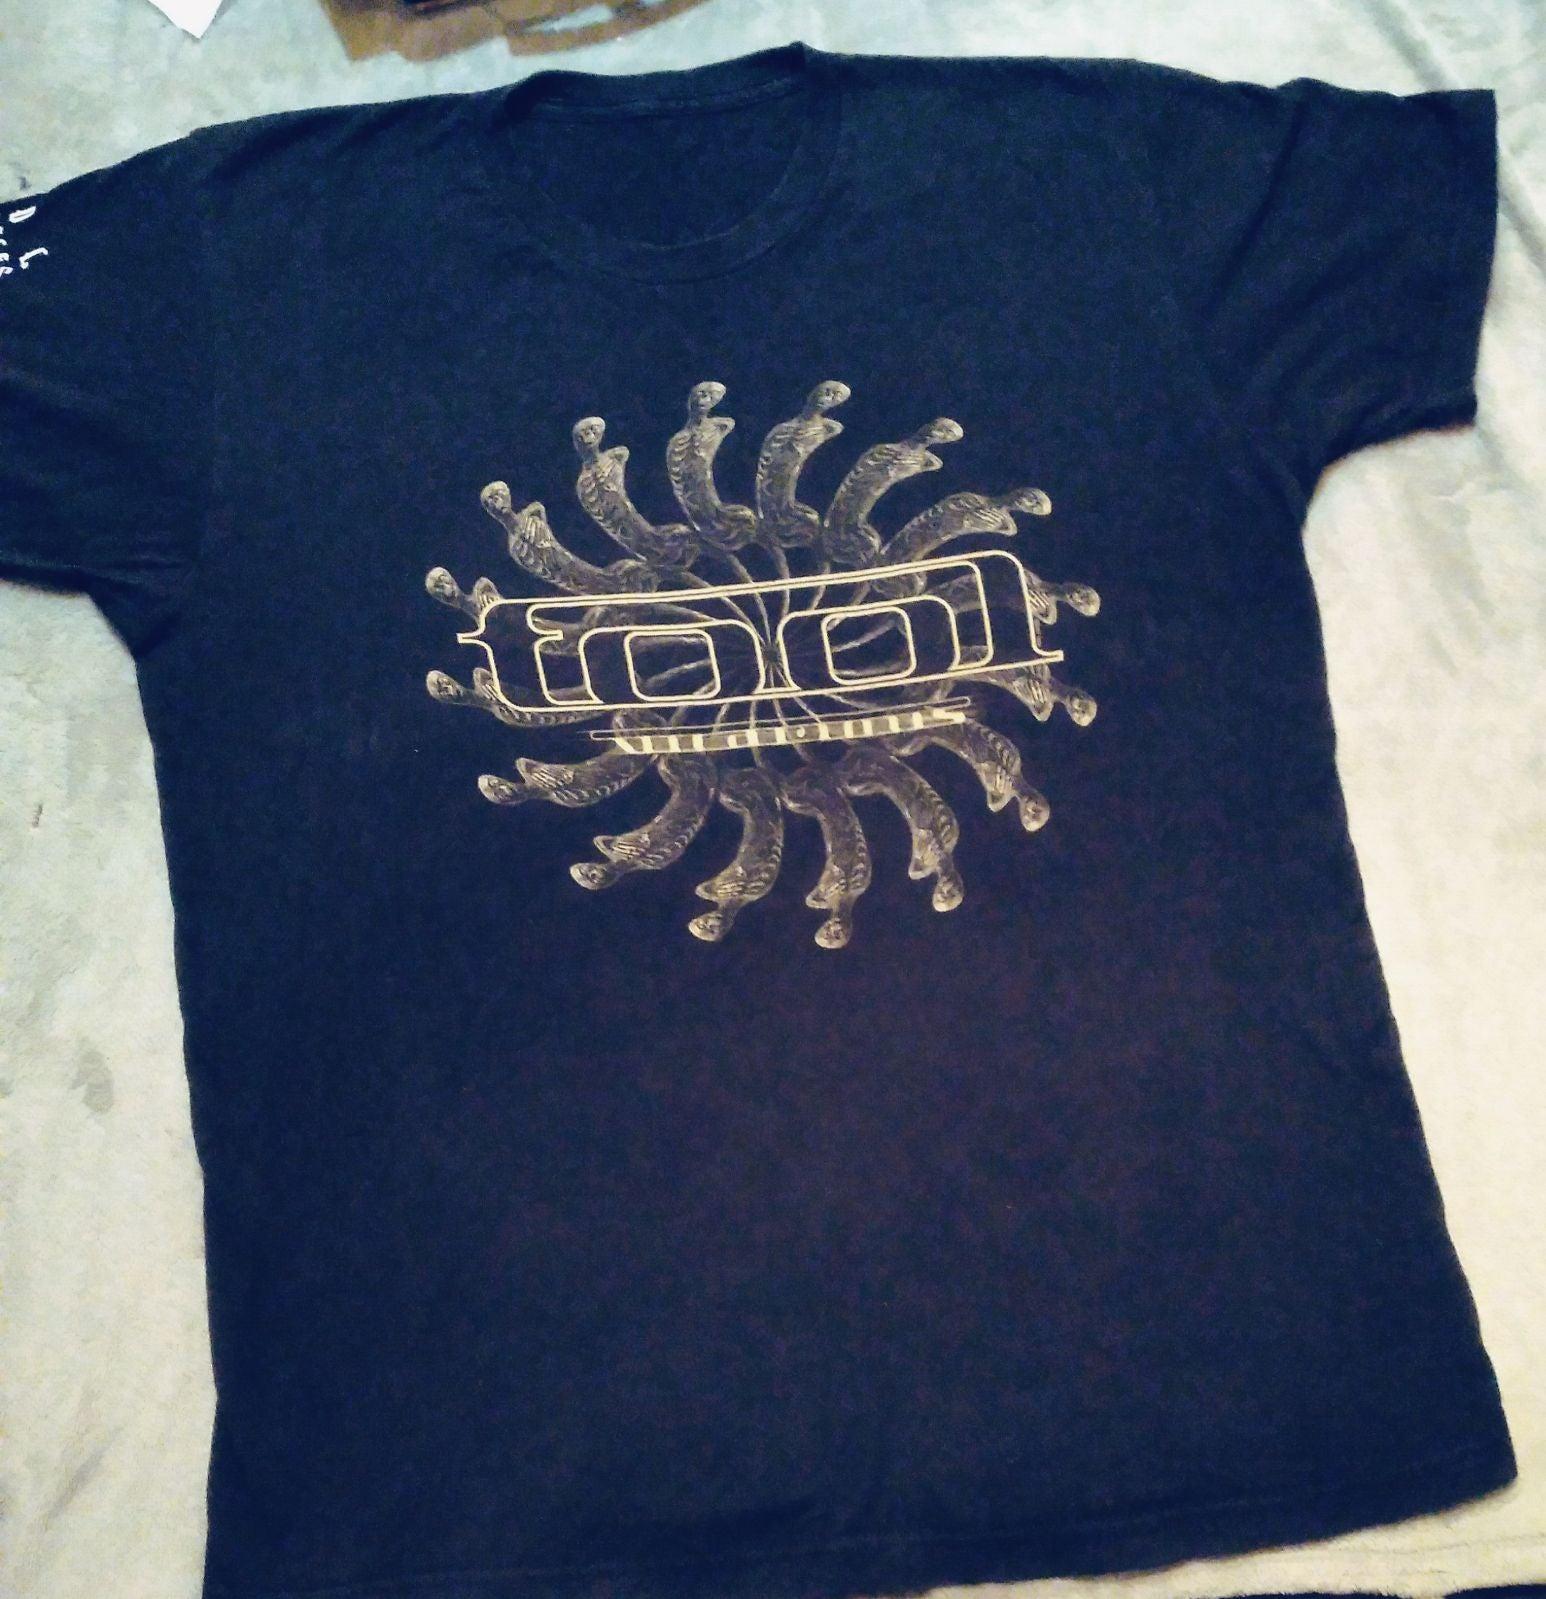 Vintage TOOL concert shirt free ship